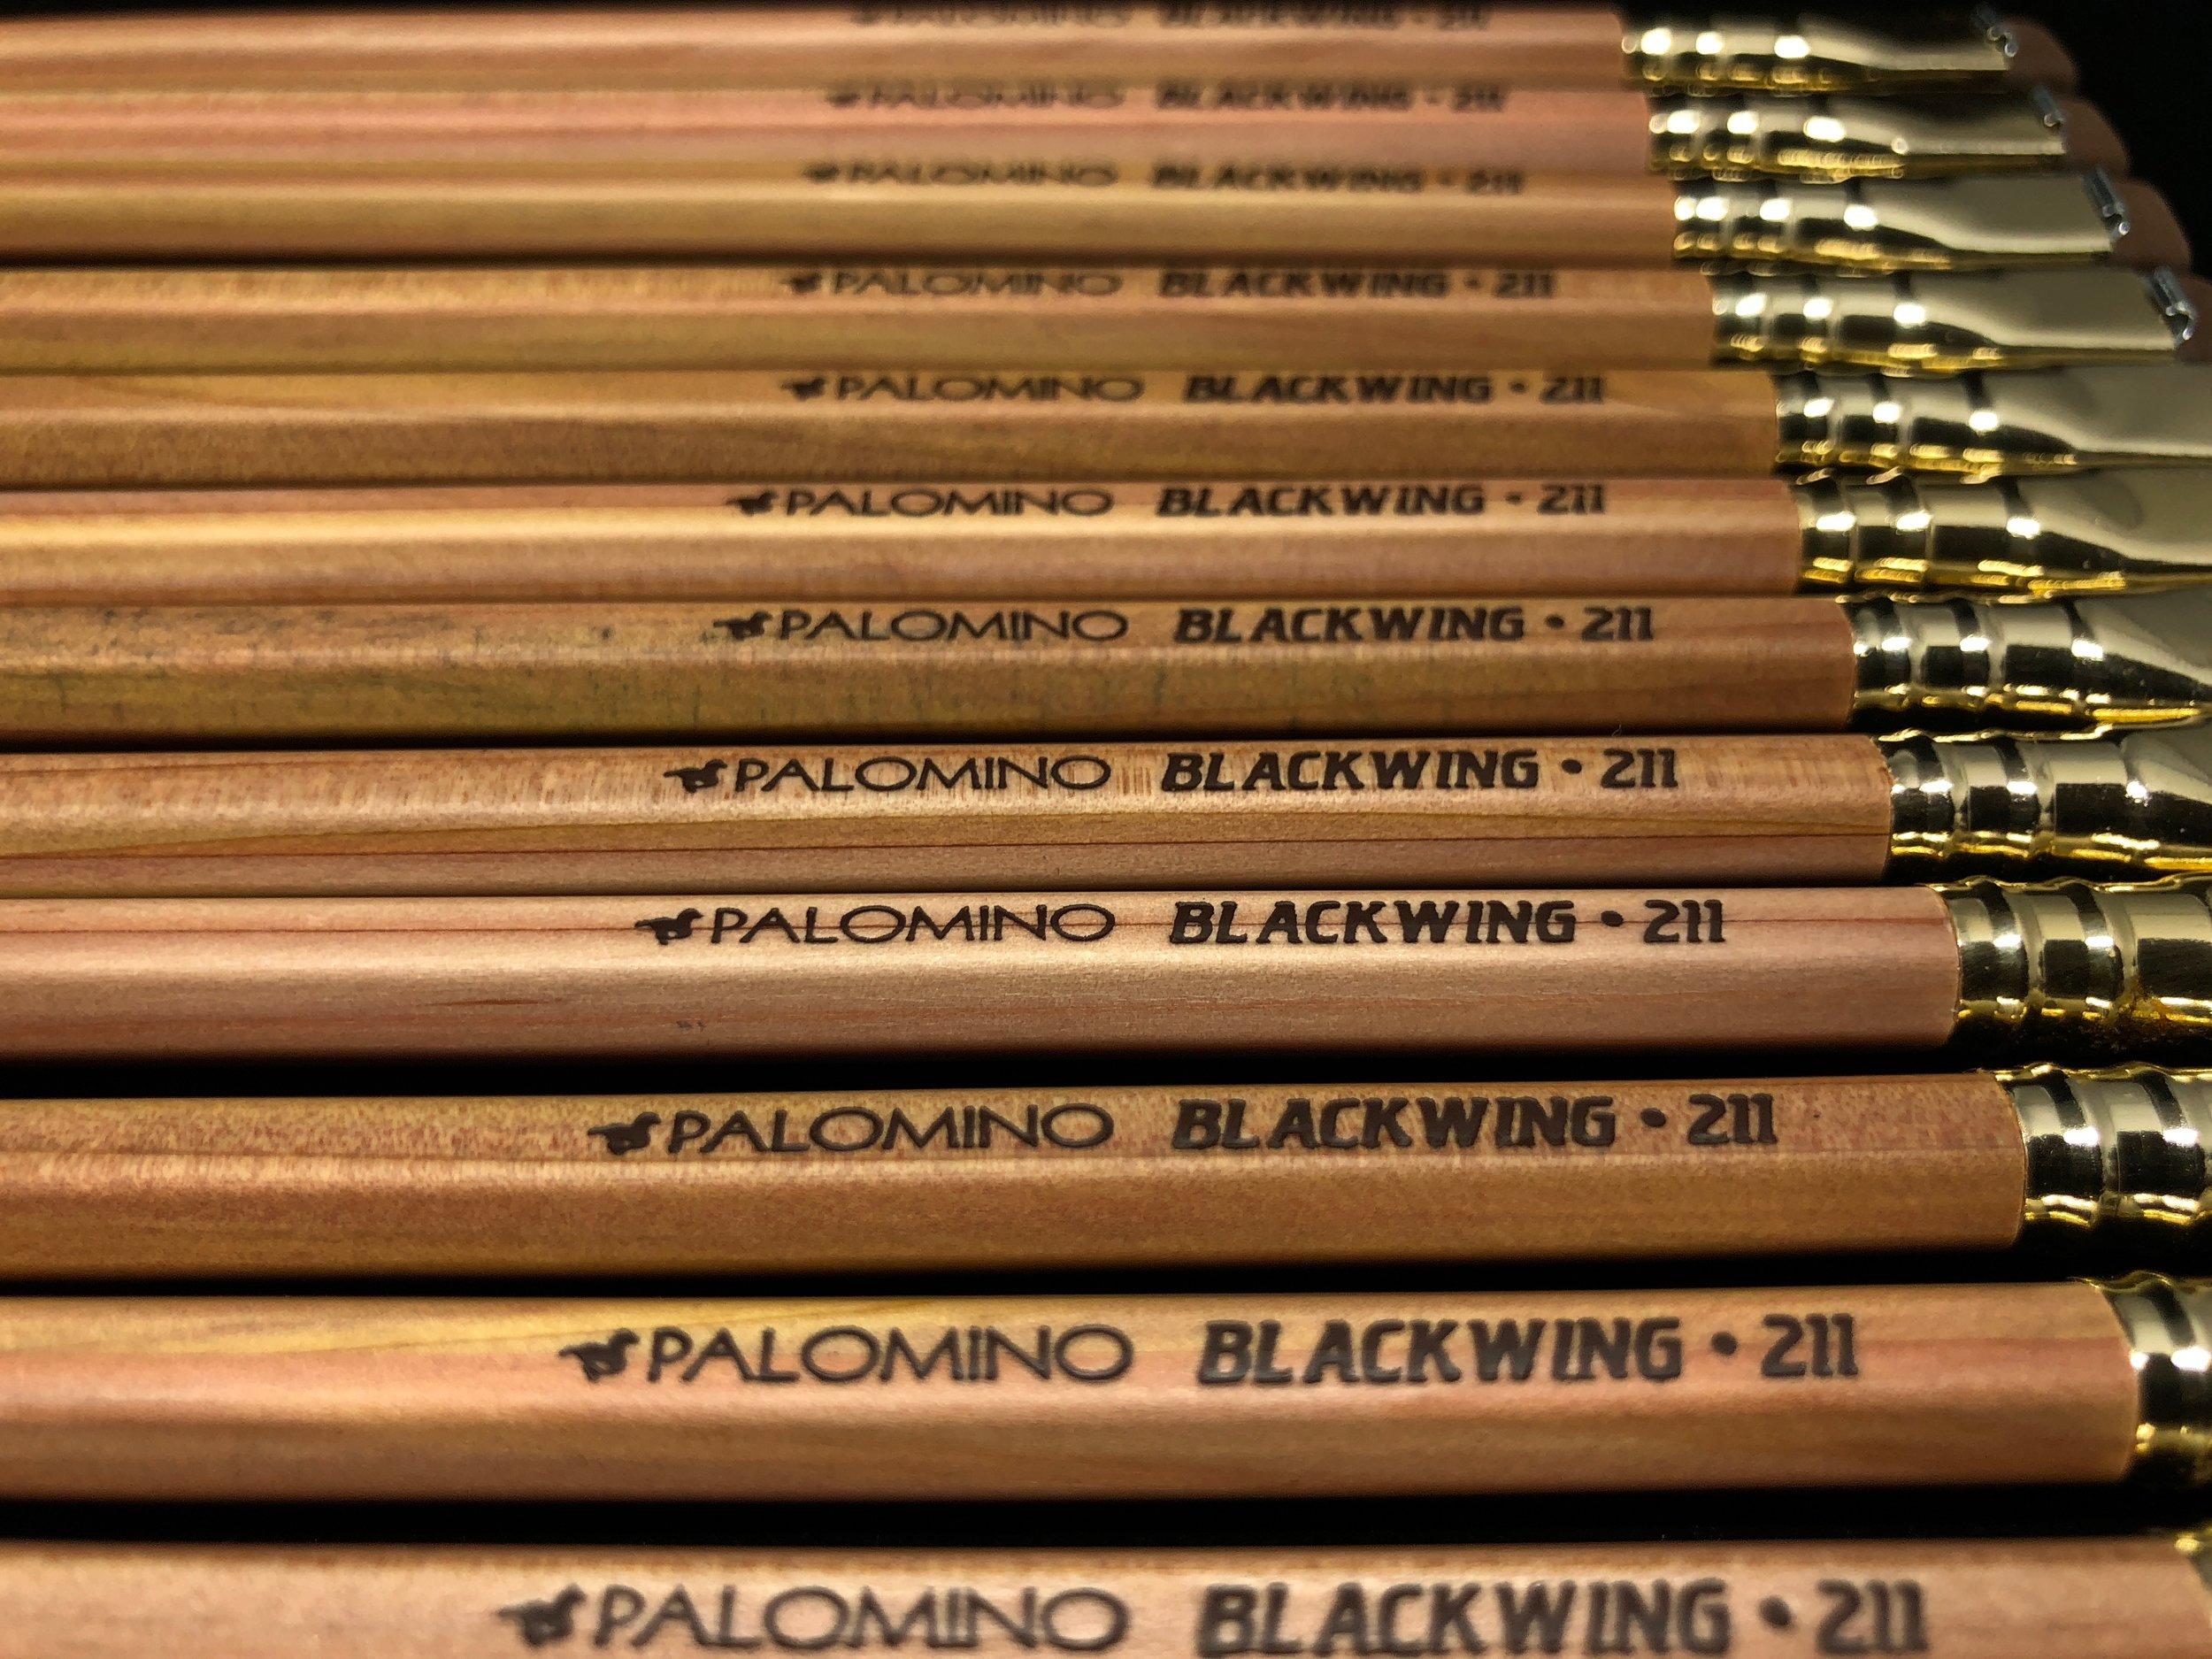 palomino-blackwing-211-pencil-8.jpg